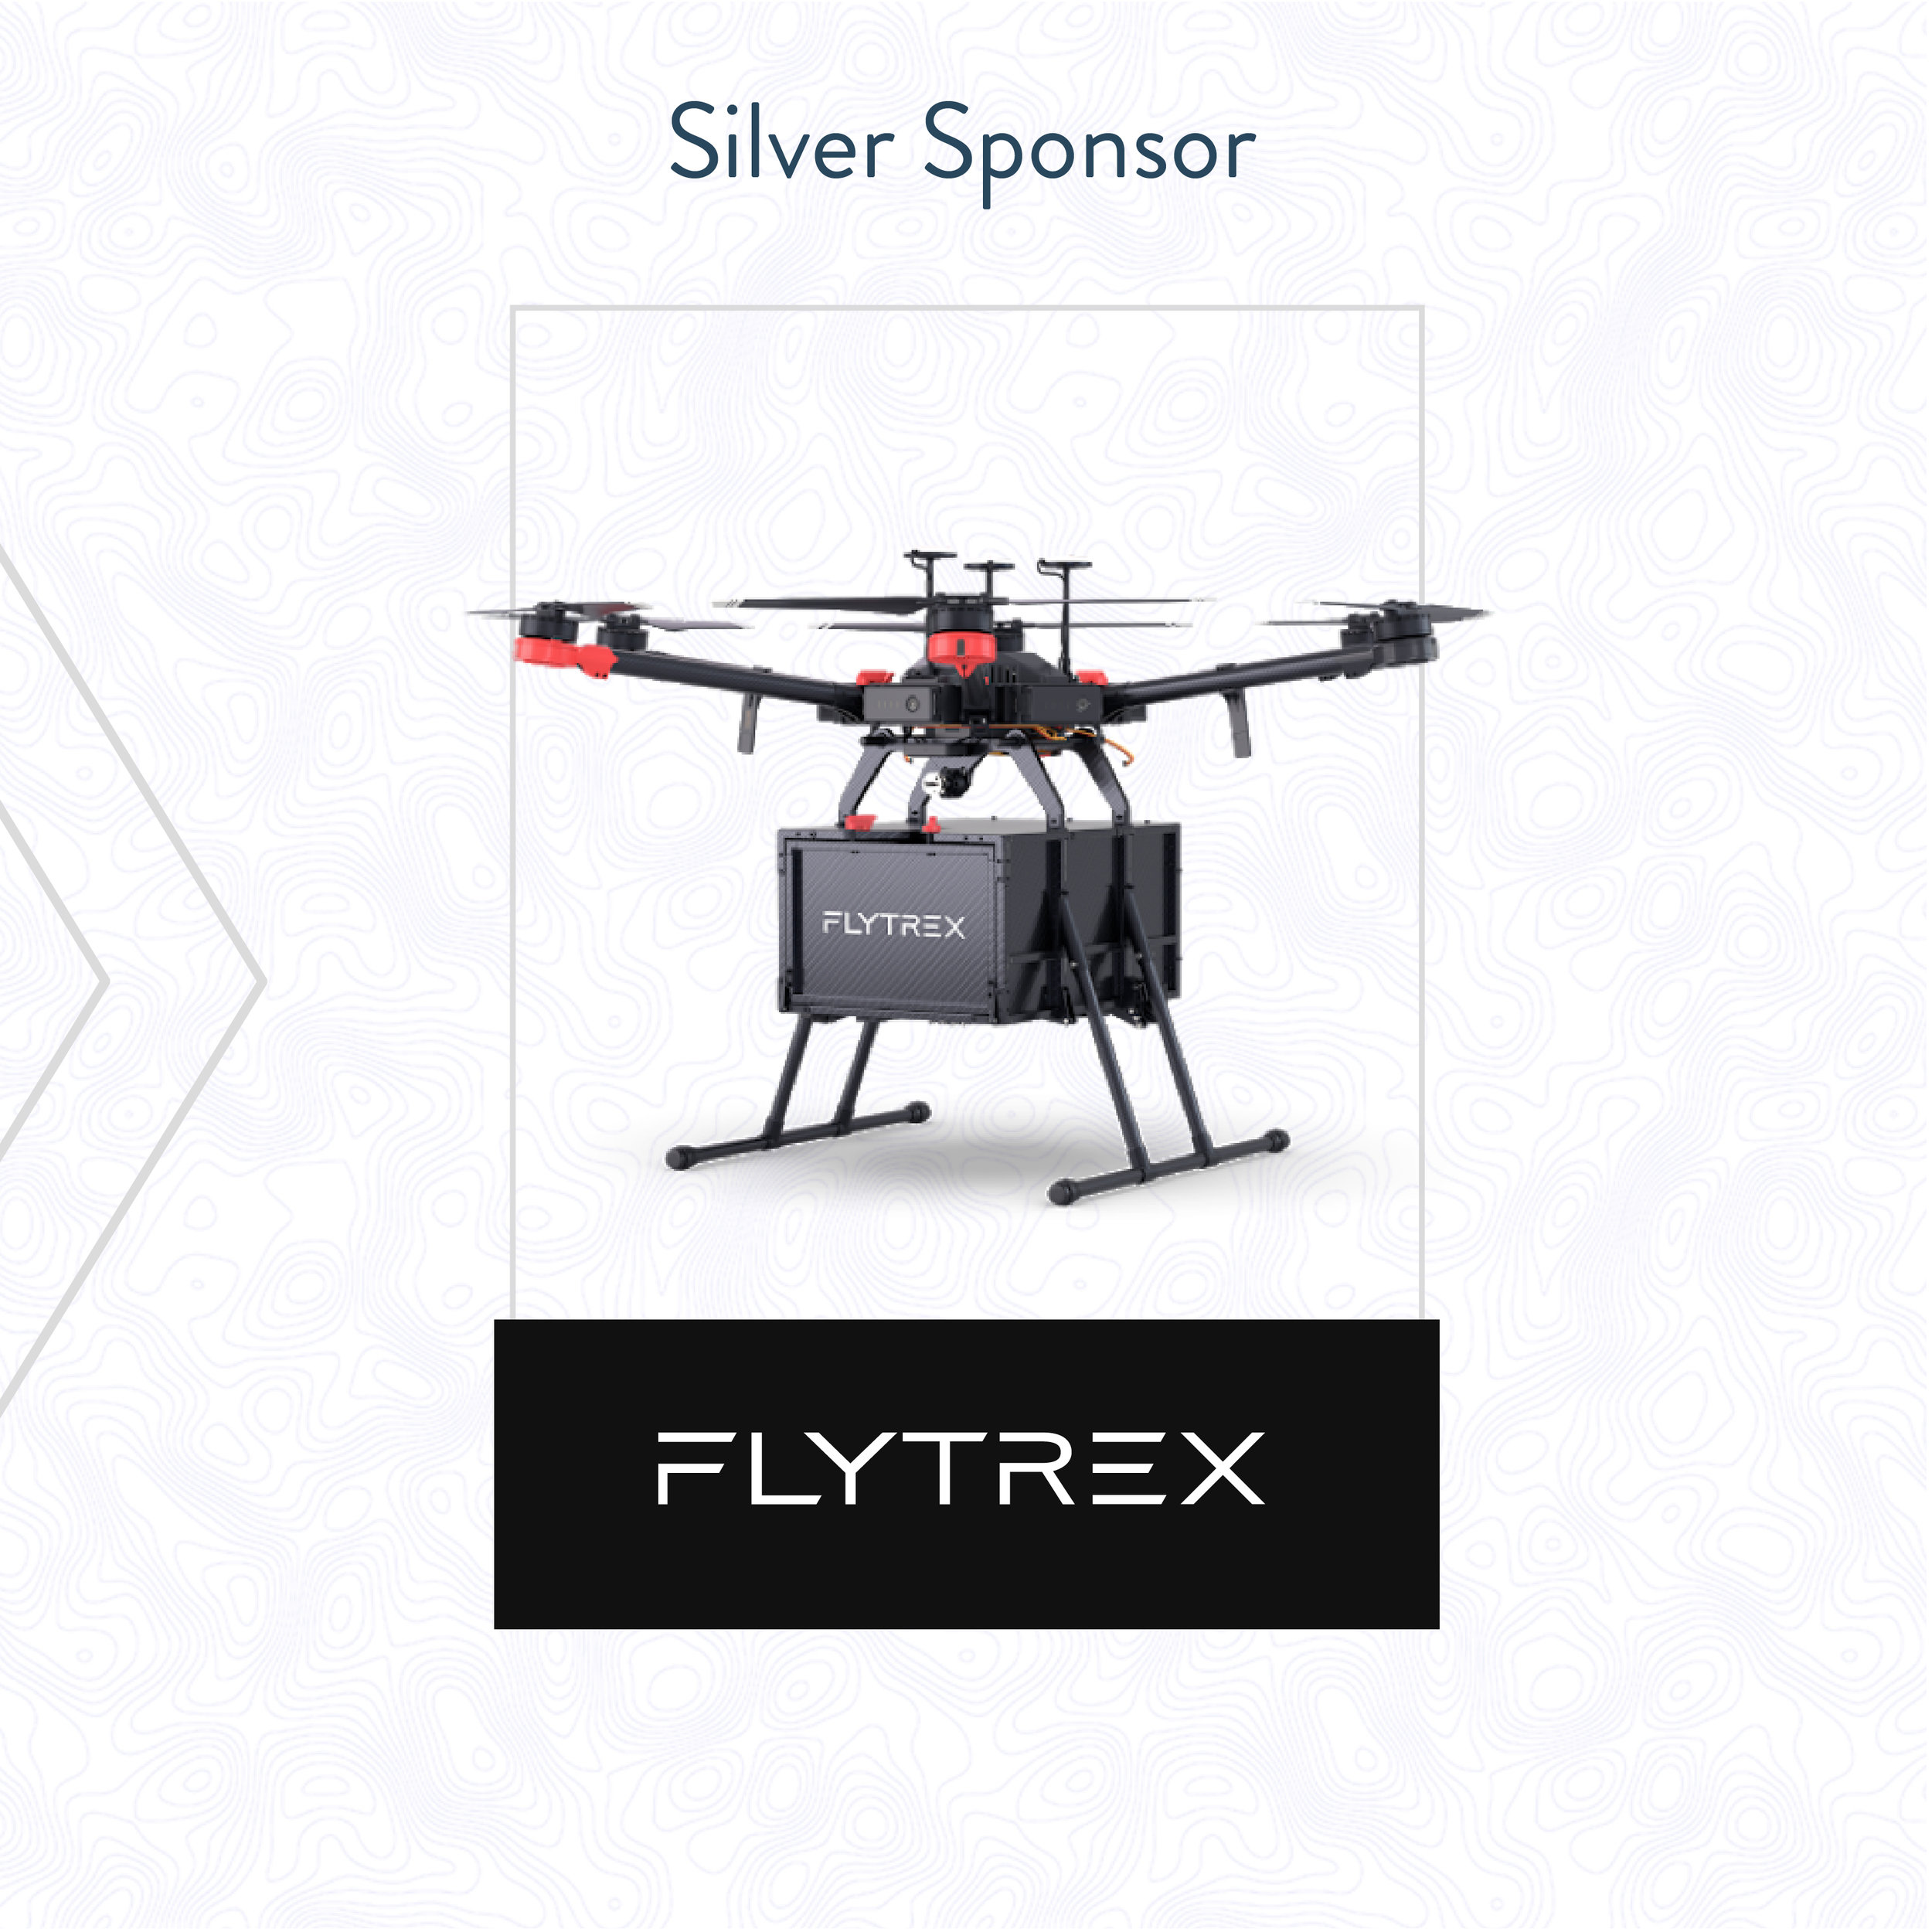 flytrex.jpg